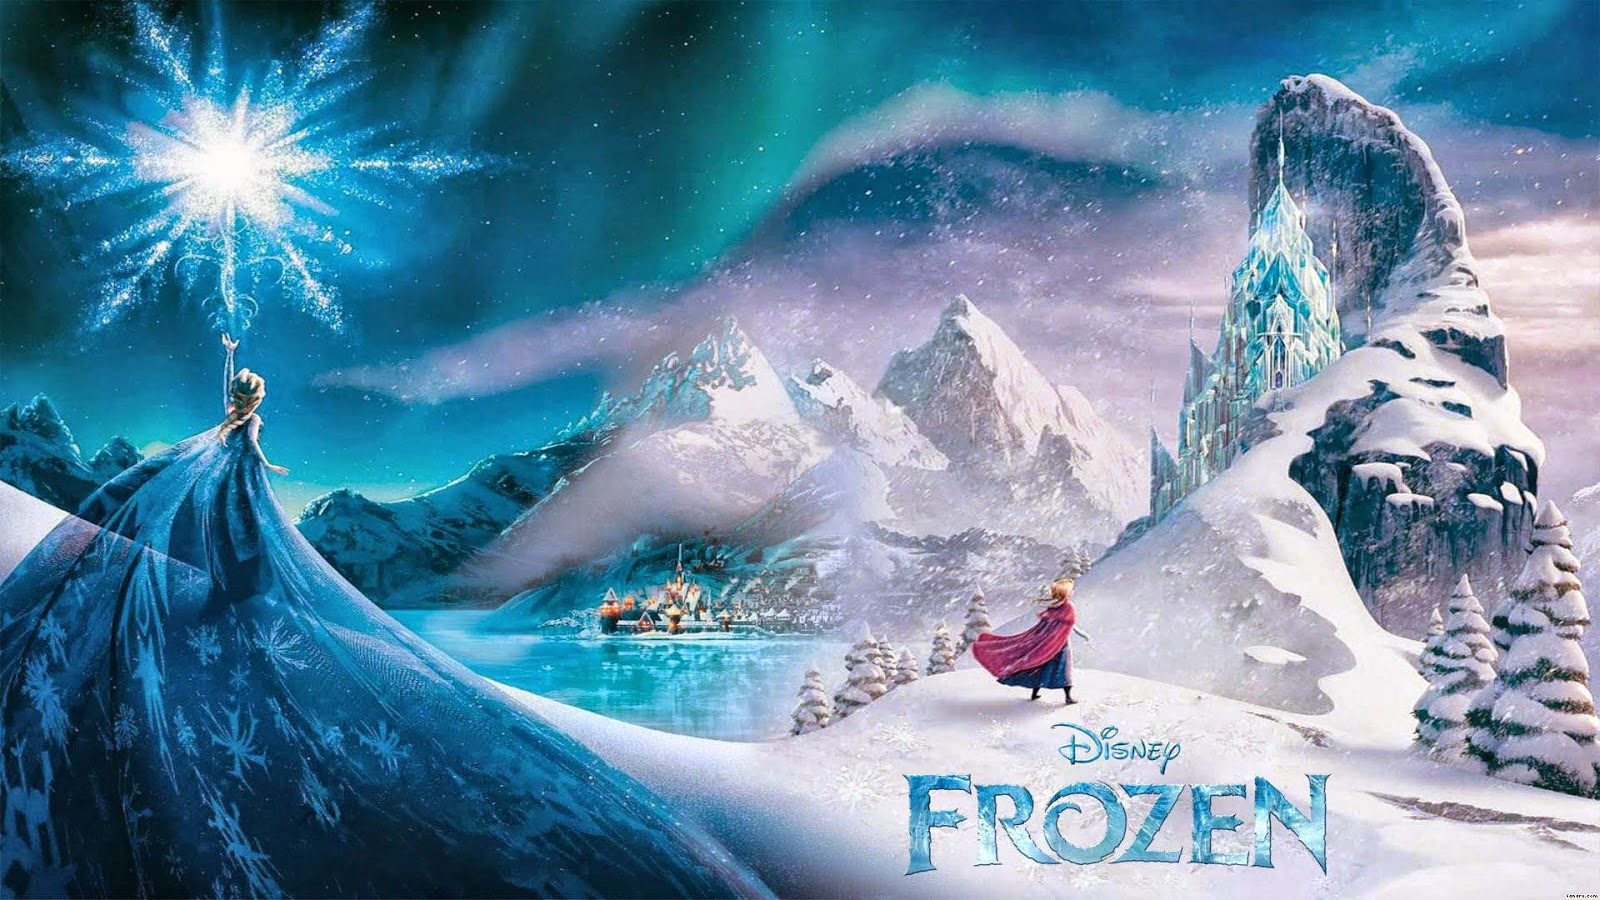 Frozen Wallpaper HD 1080p